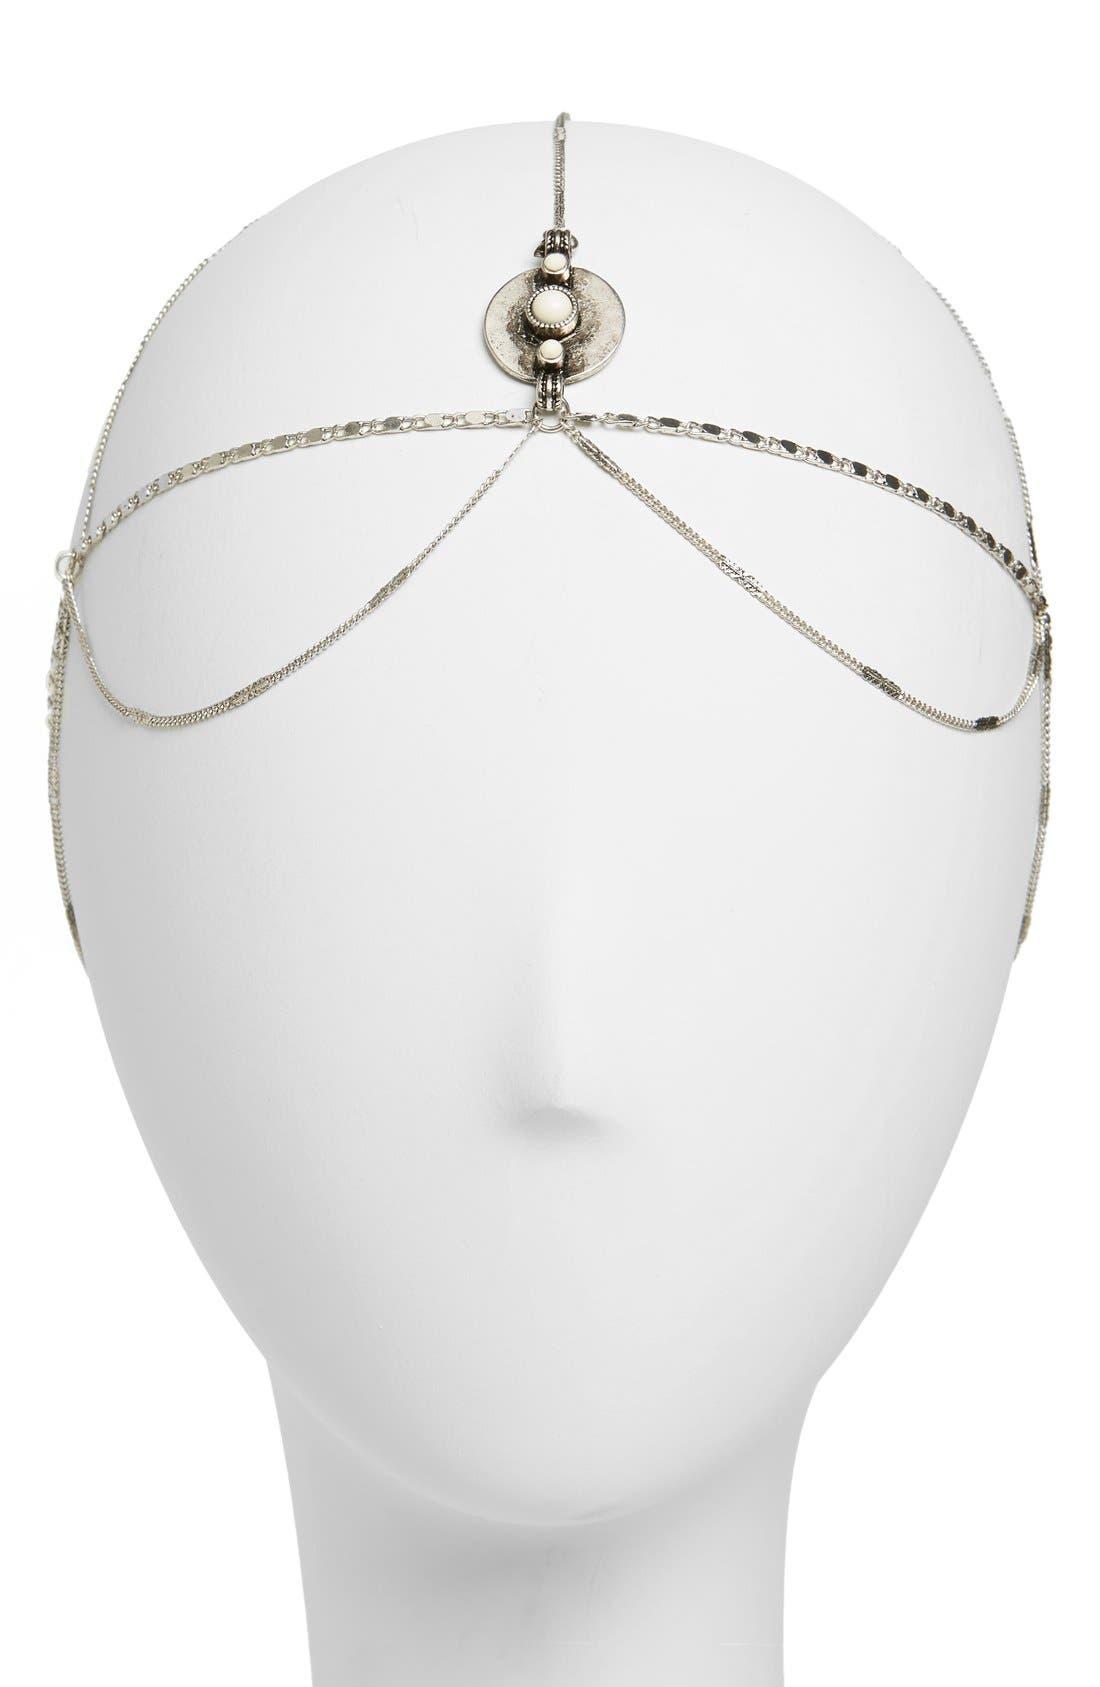 Alternate Image 1 Selected - Berry 'Goddess' Head Chain